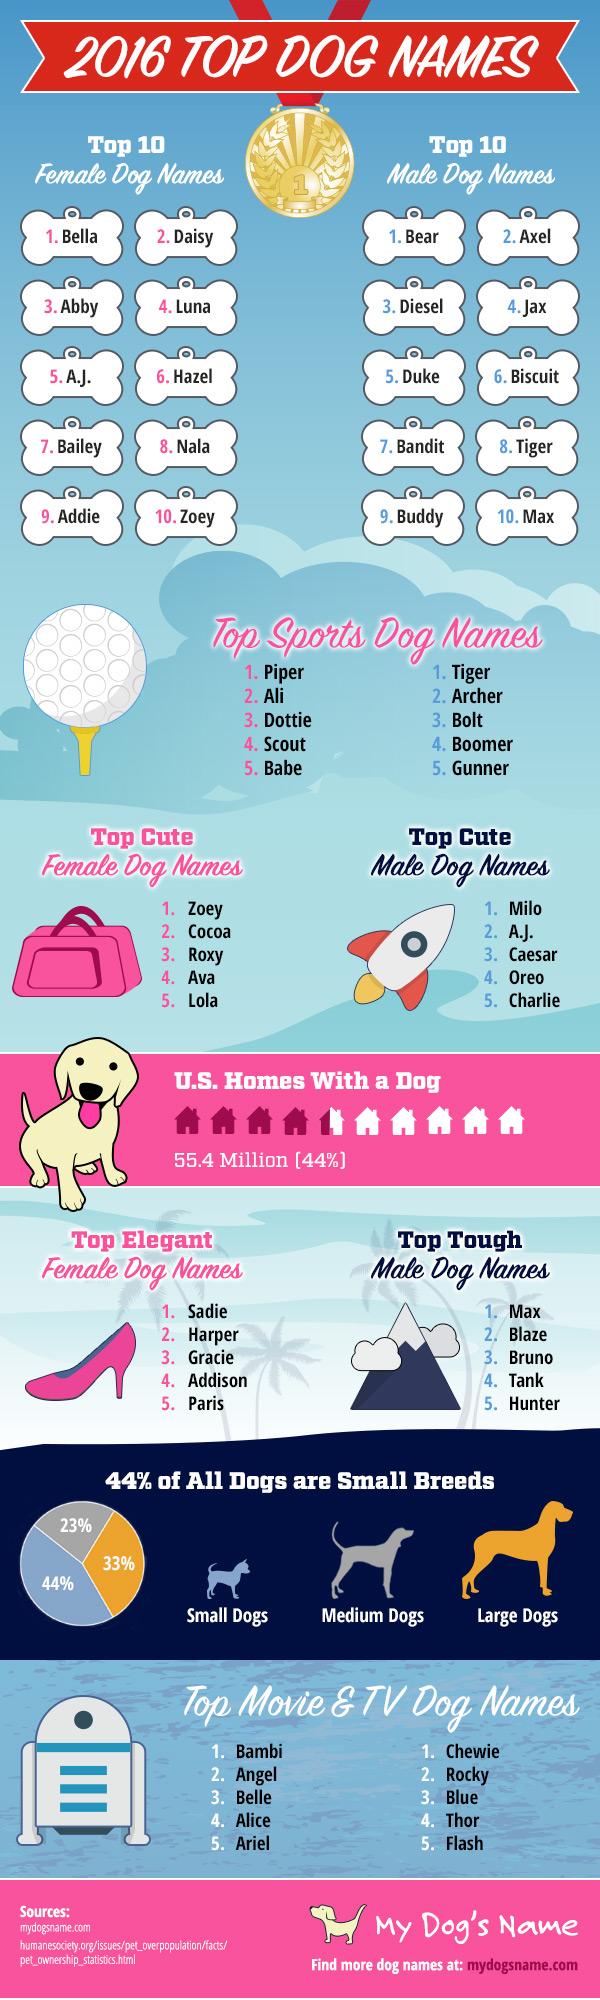 2016-dog-names